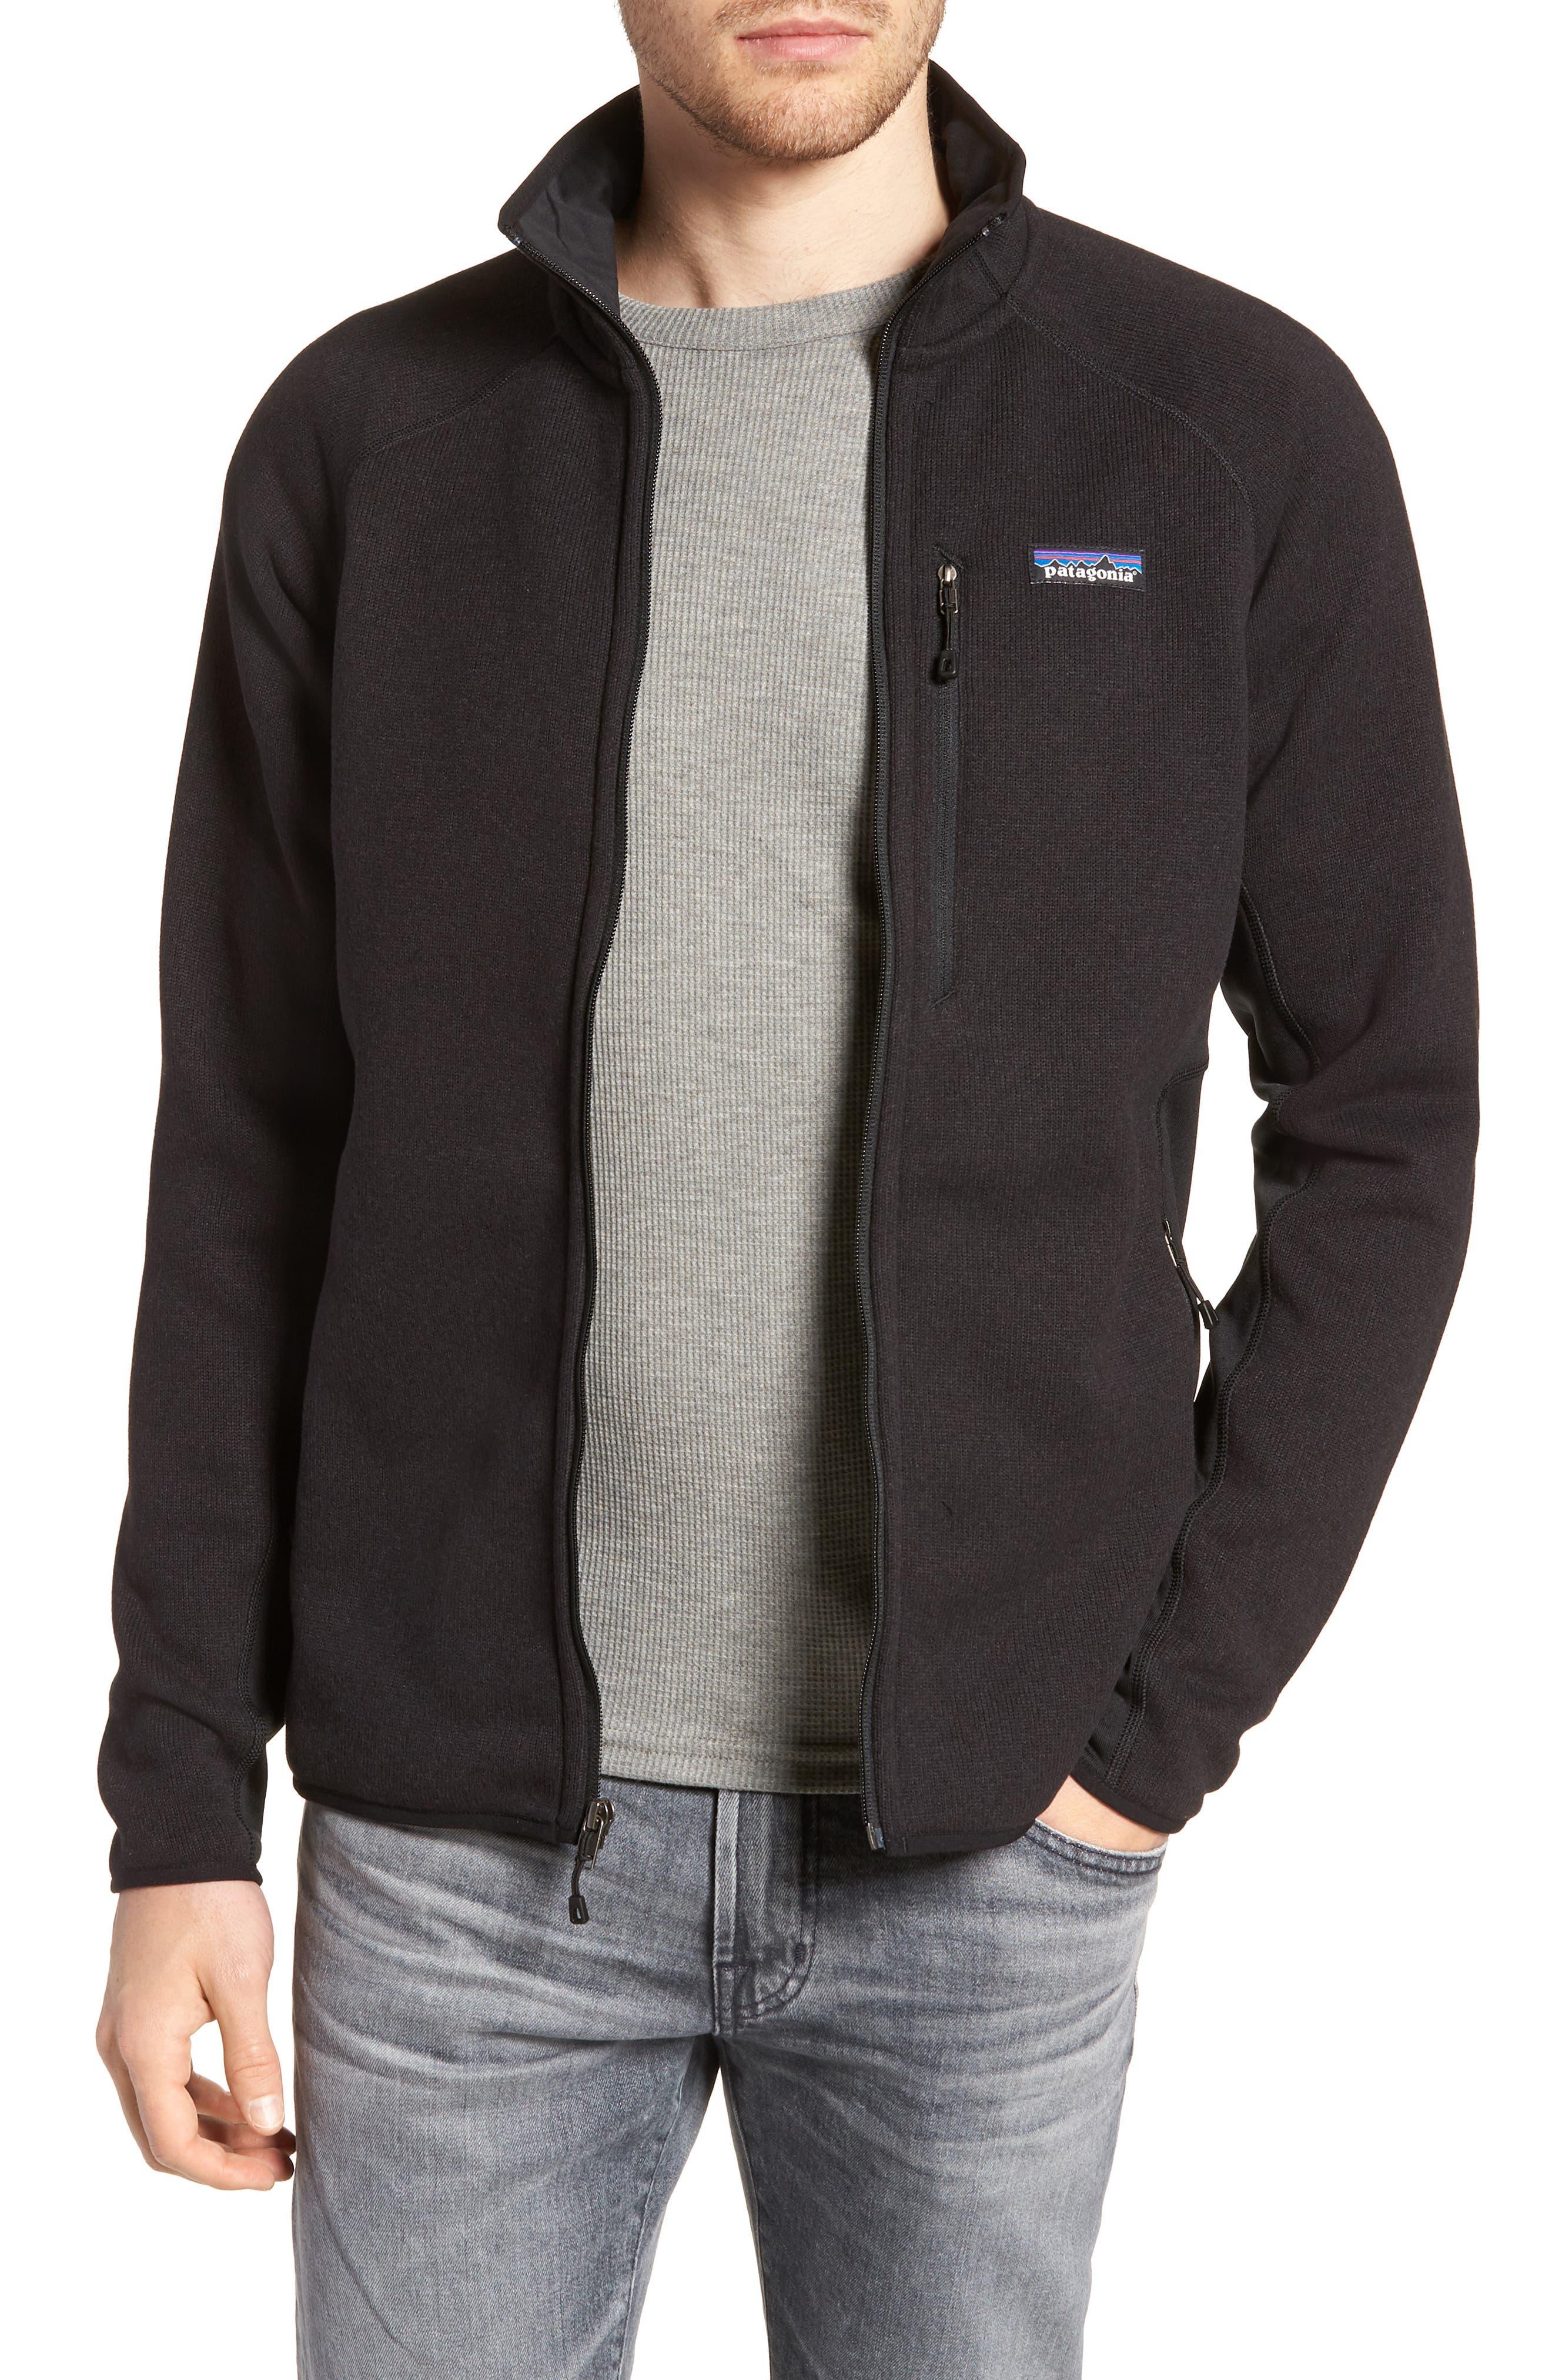 Better Sweater Zip Front Jacket,                             Main thumbnail 1, color,                             Blk